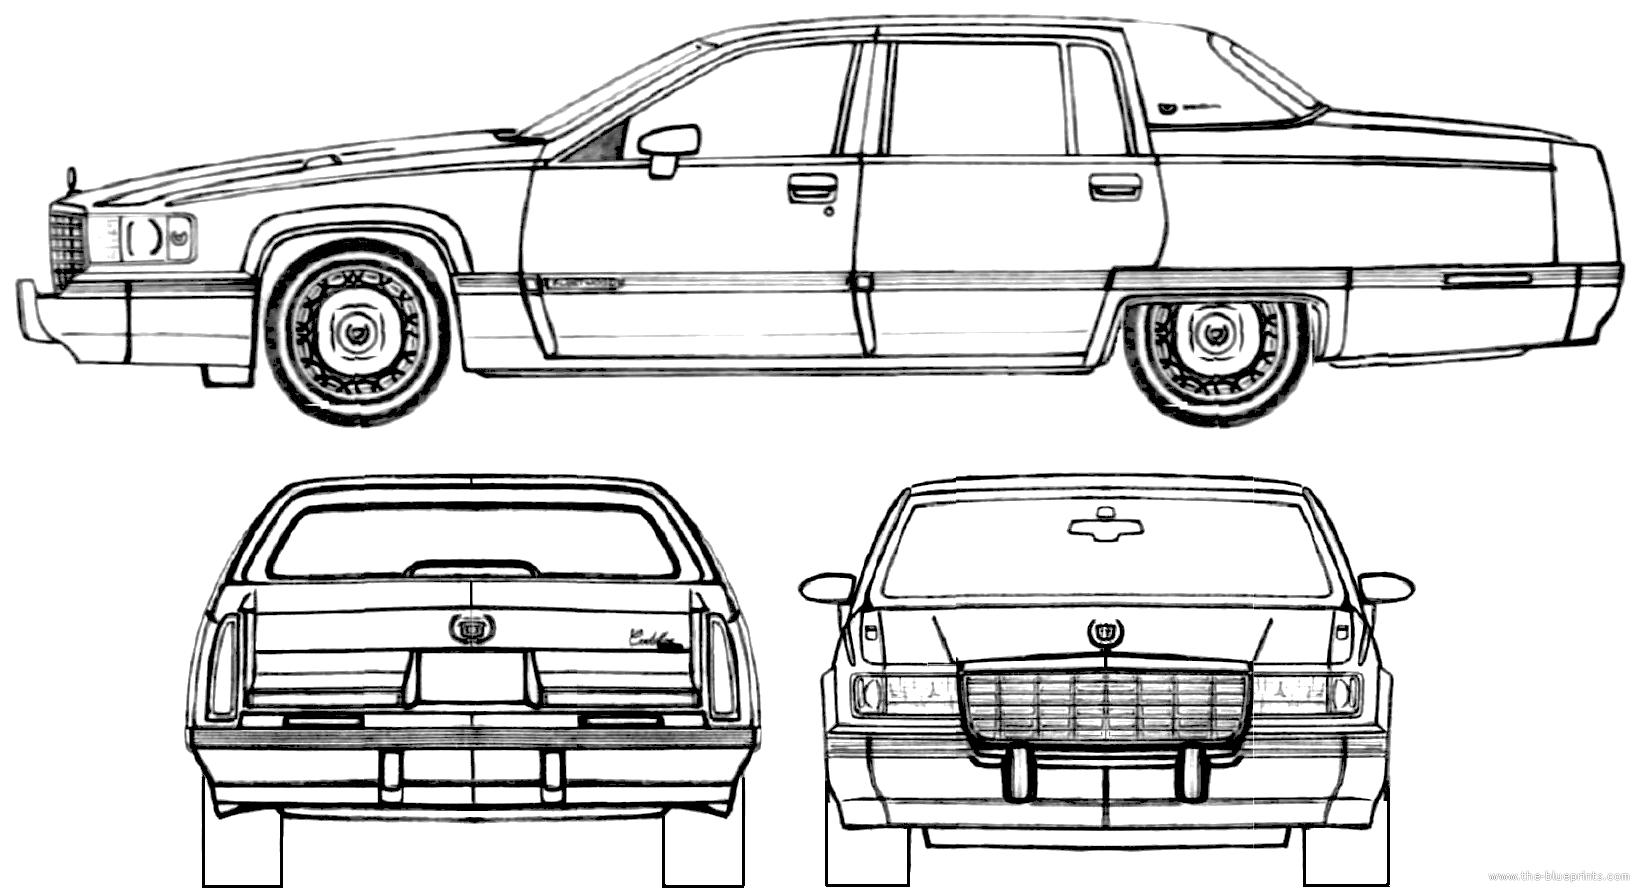 Blueprints > Cars > Cadillac > Cadillac Fleetwood (1994)